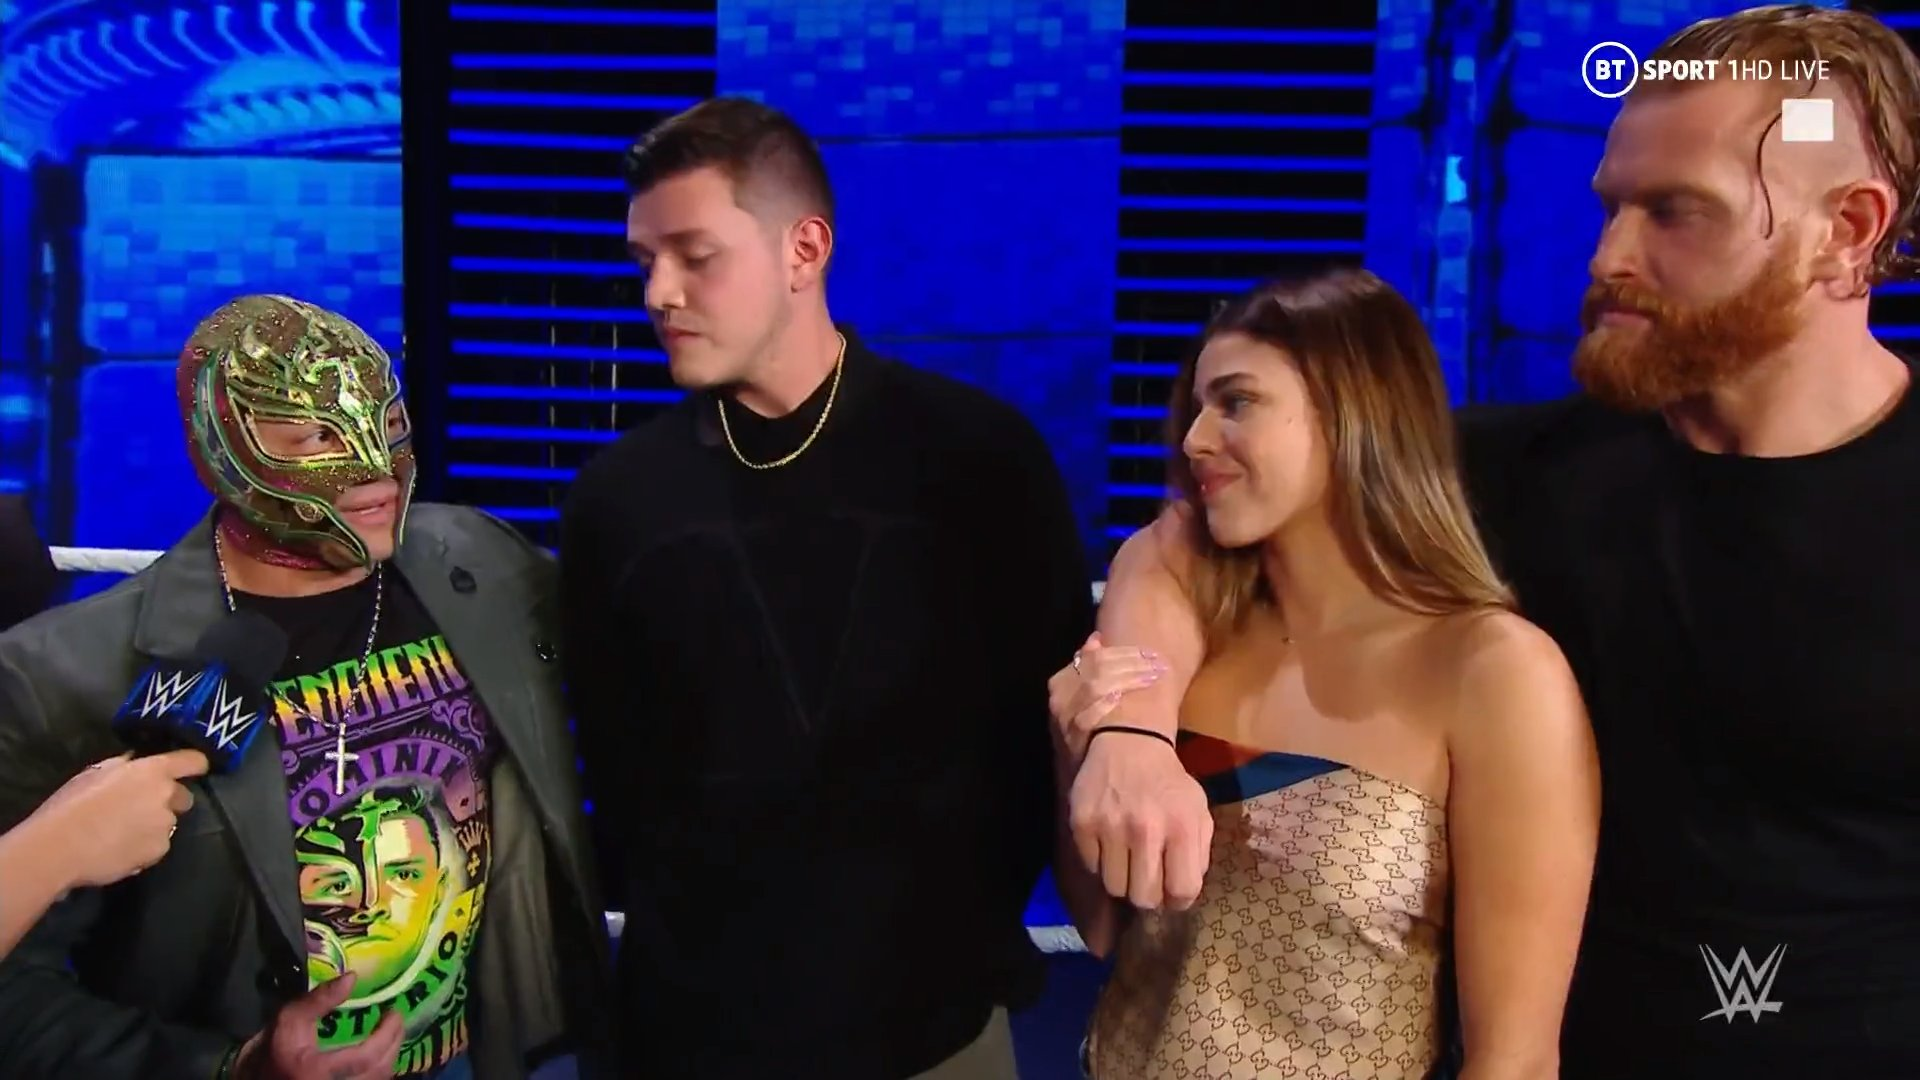 Rey Mysterio Dominik Aalyah & Murphy Smackdown November 27, 2020